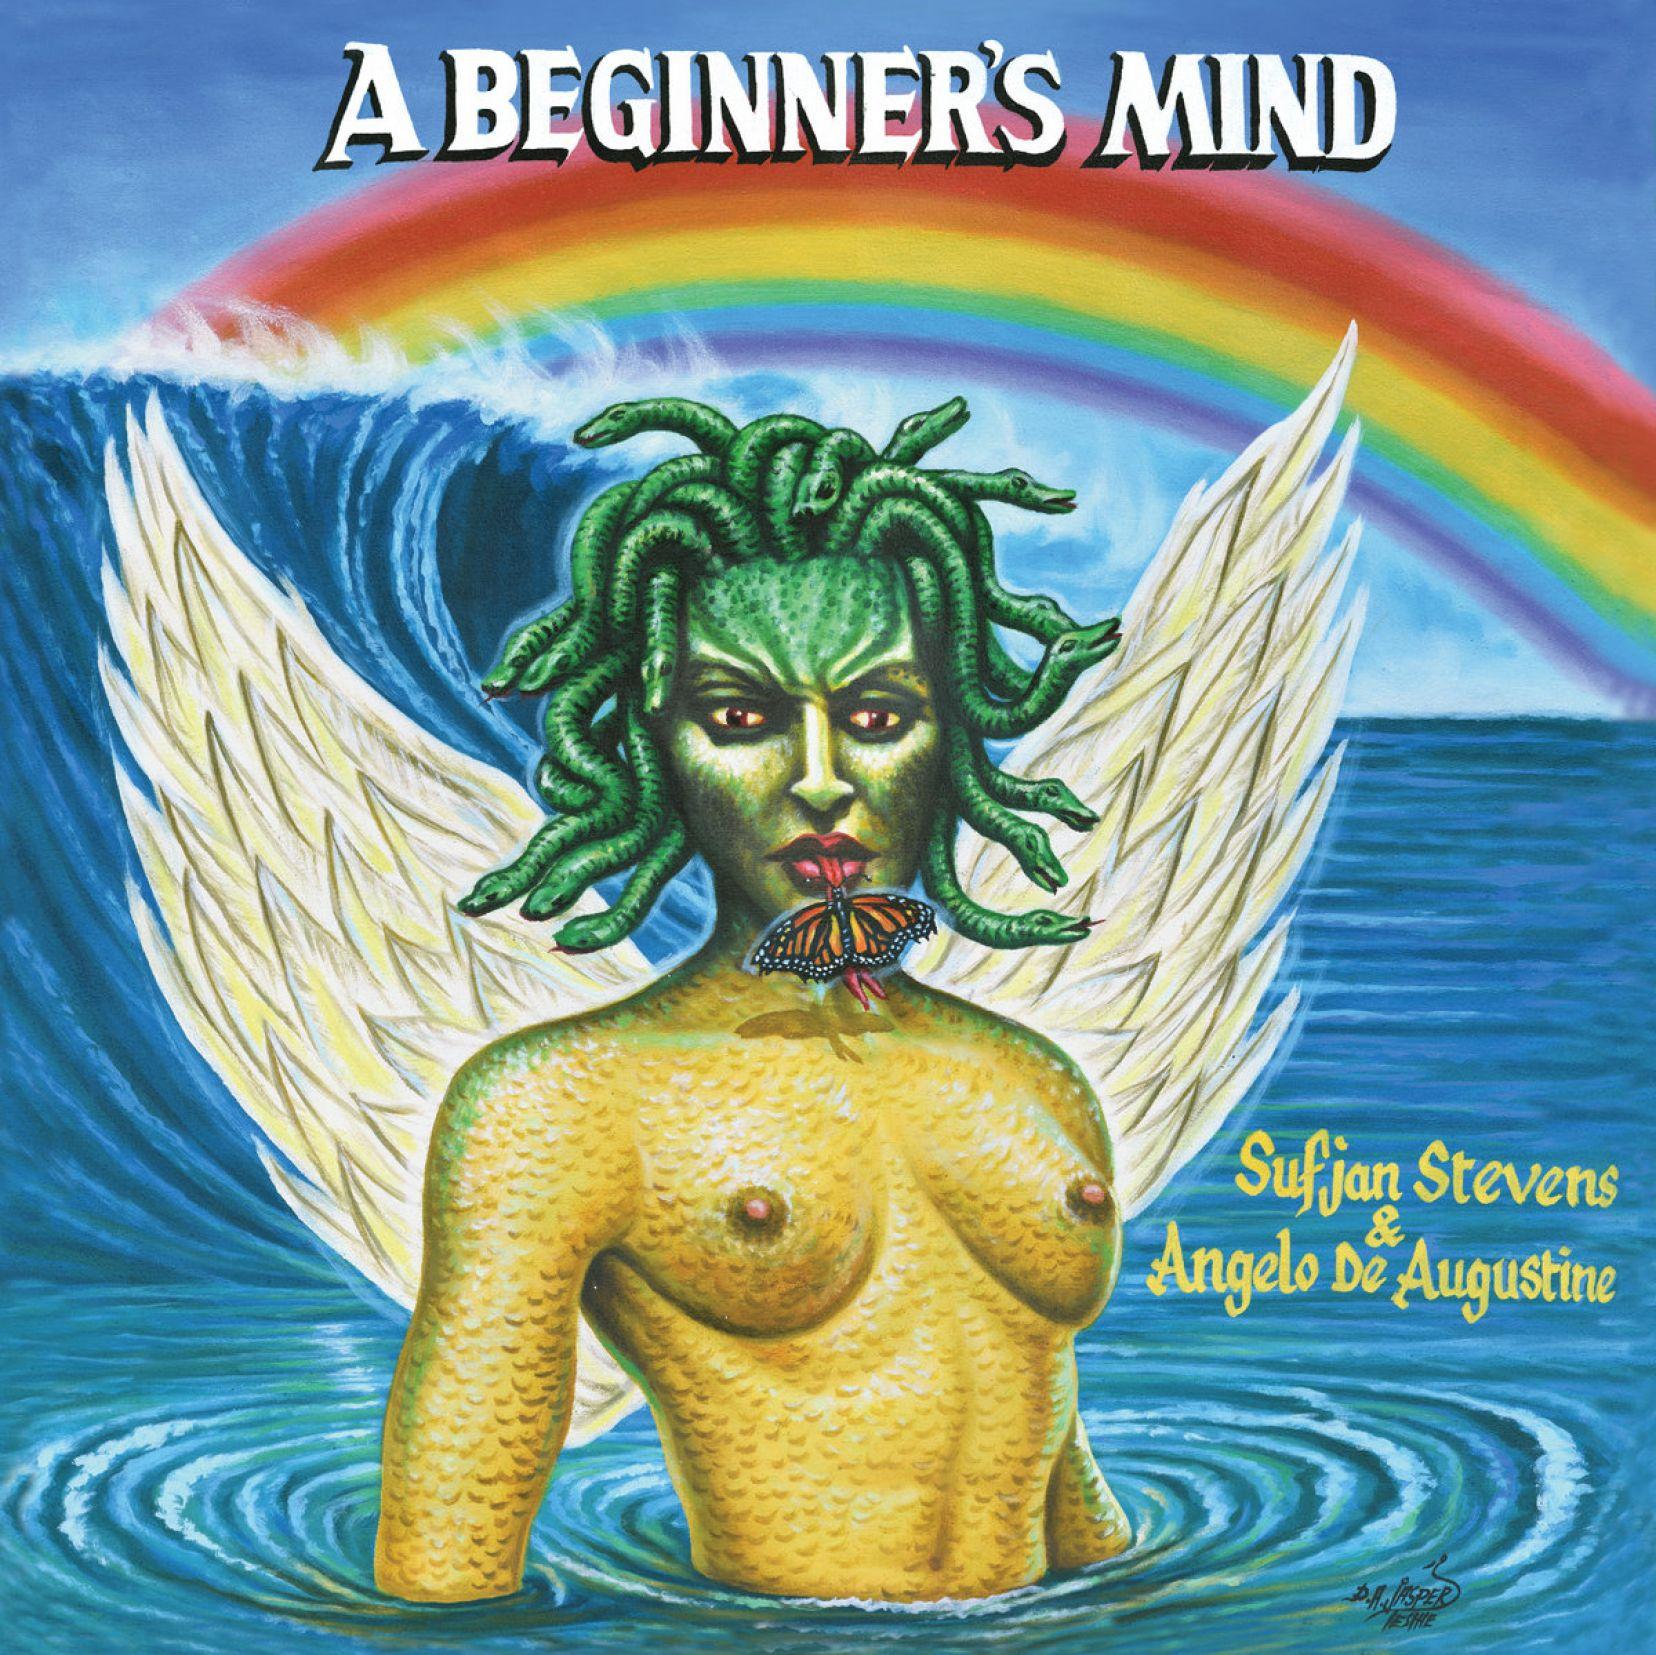 A Beginner's Mind